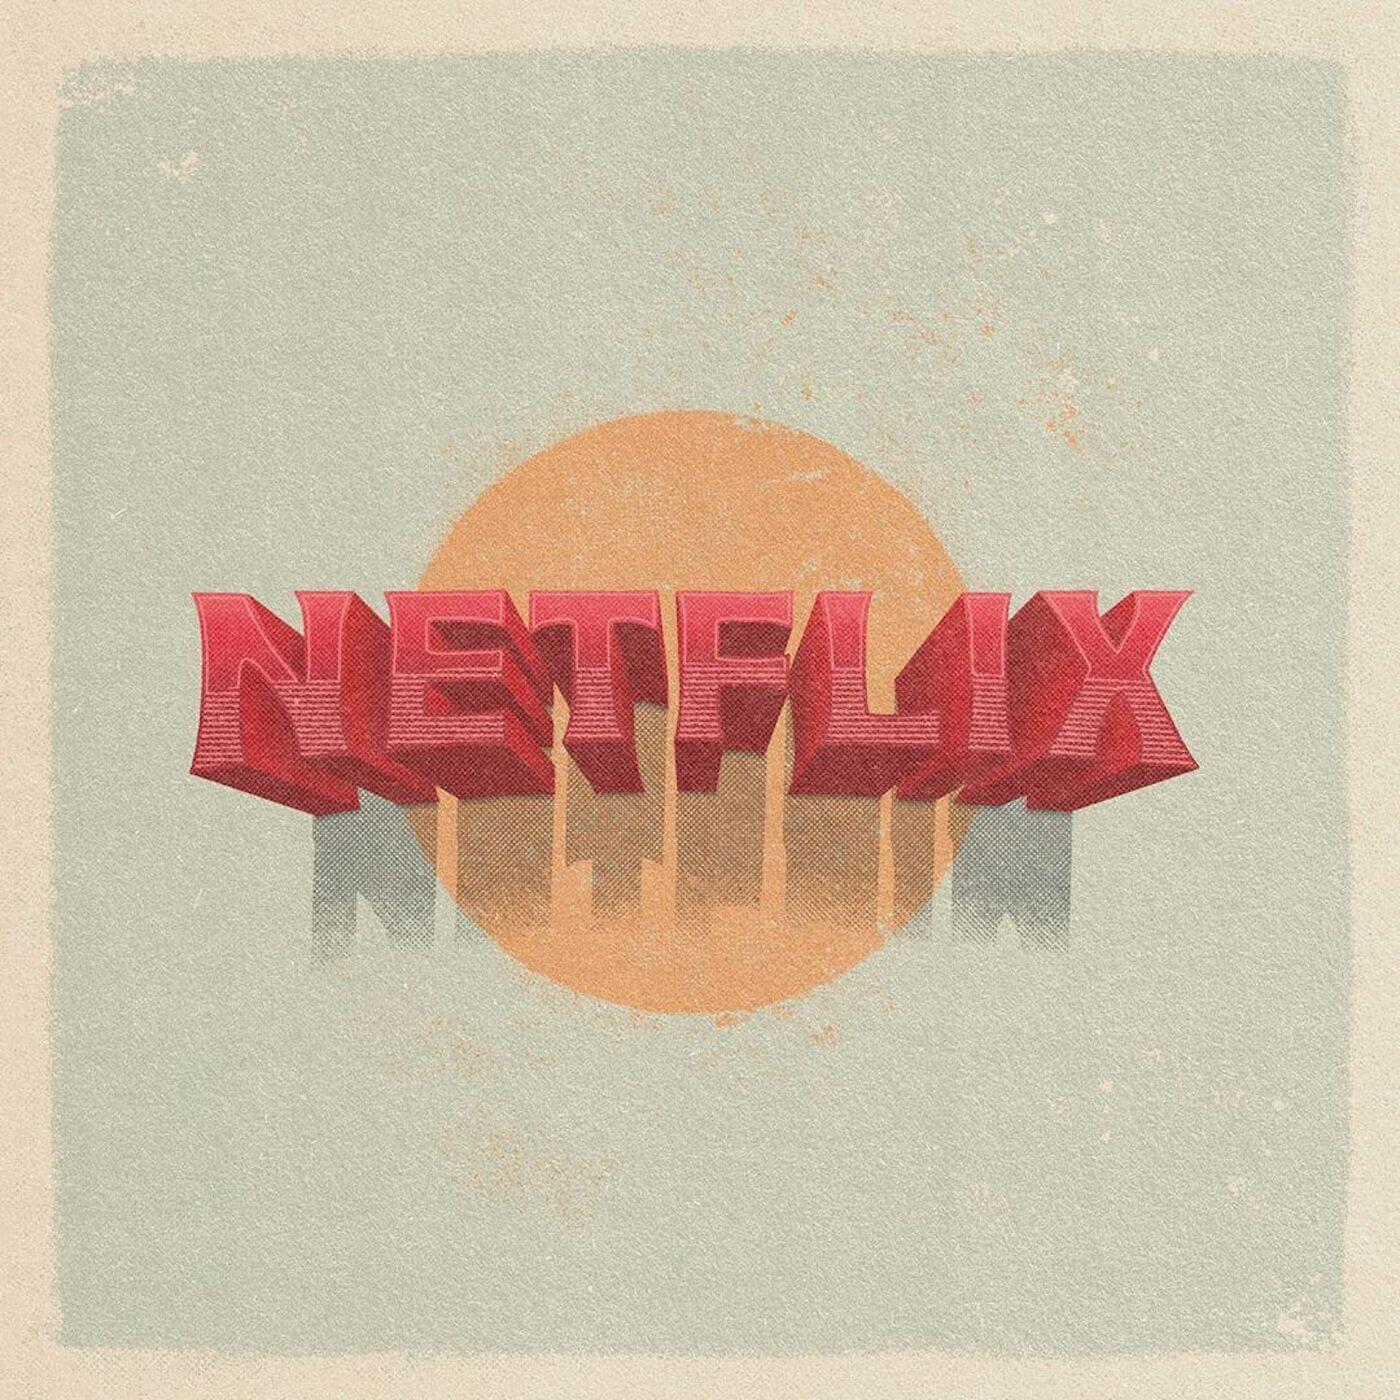 Modern Logos Designed in Vintage Style -santiago-colombo 10-min